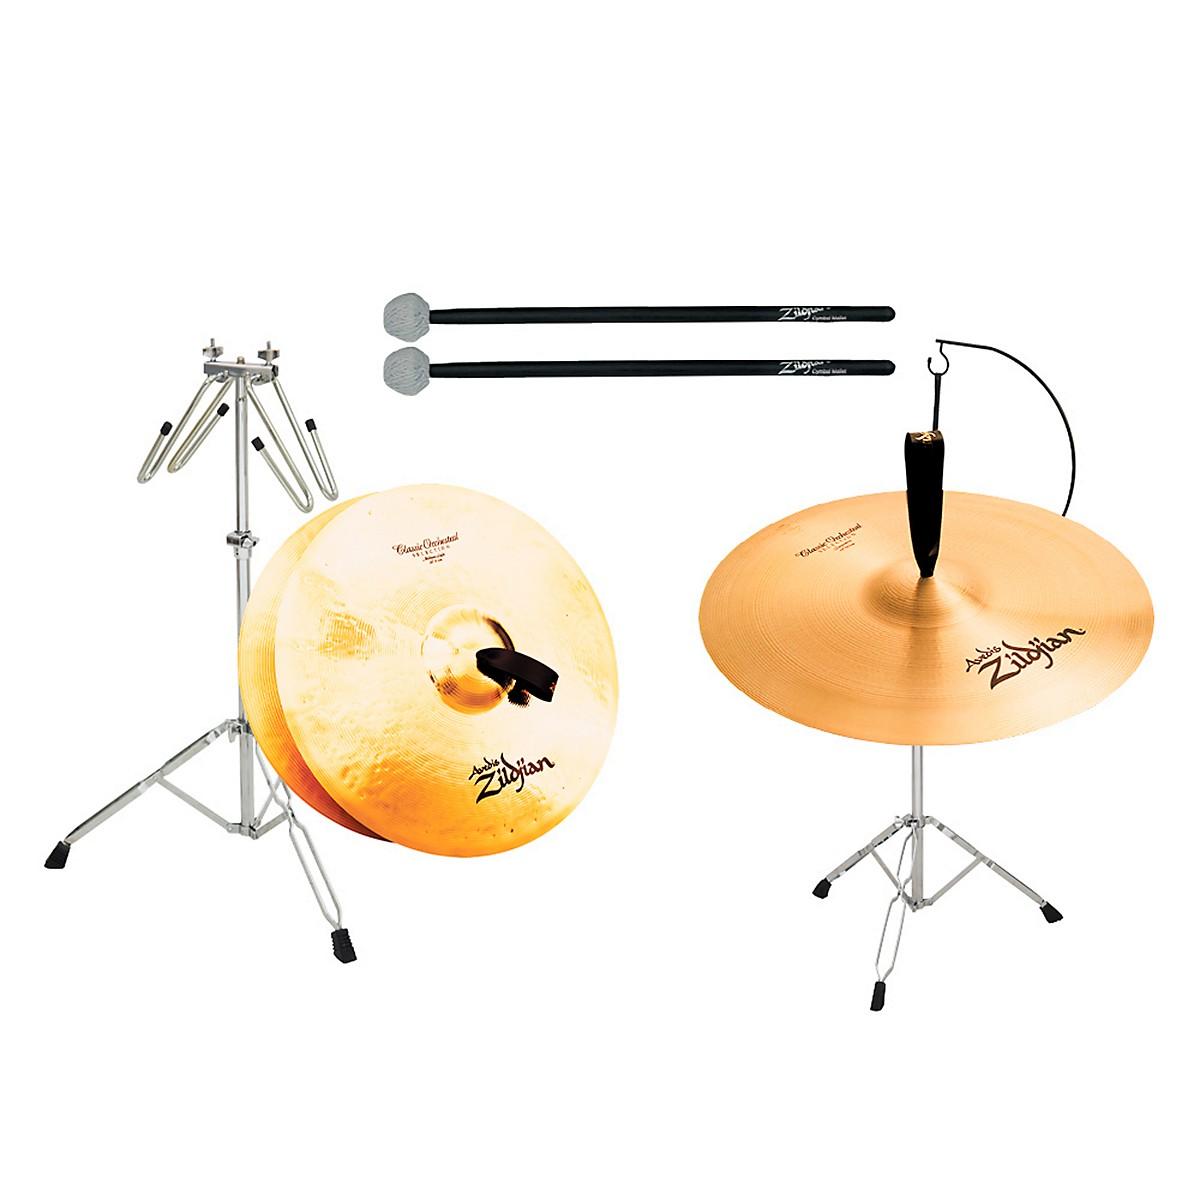 Zildjian Classic Orchestral Cymbal Educator Pack